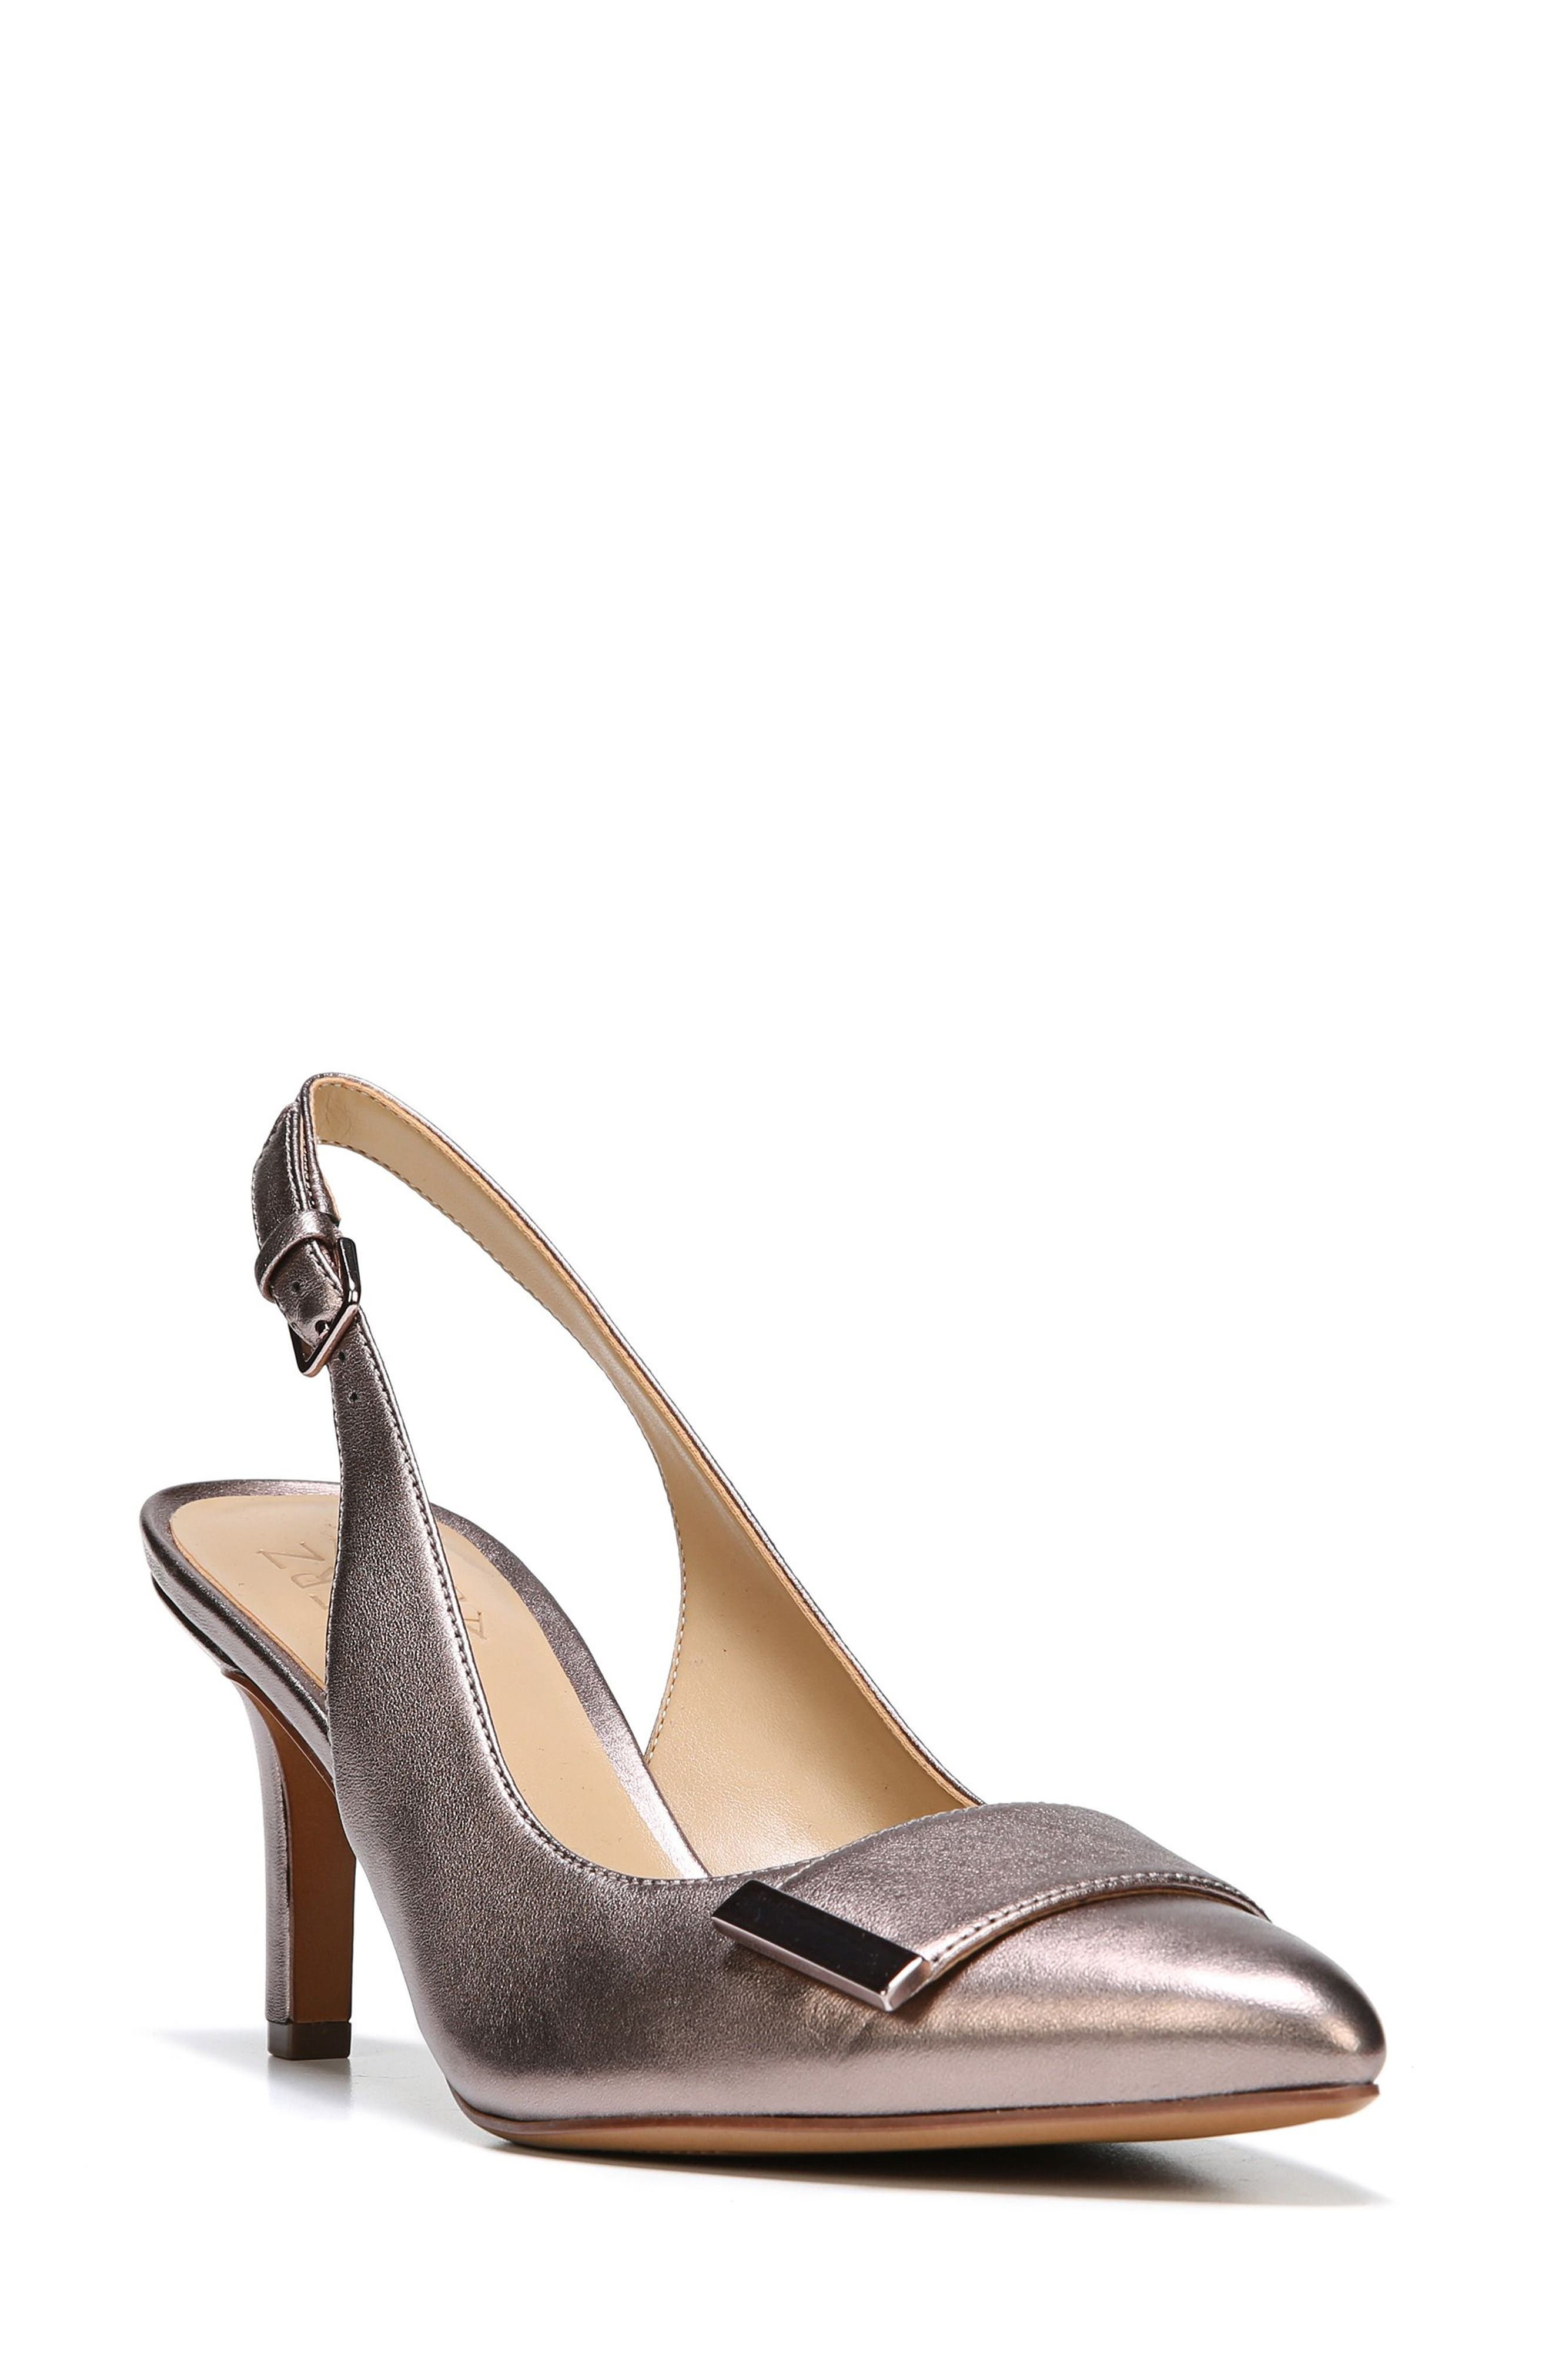 Nicolette Slingback Pump,                             Main thumbnail 1, color,                             Bronze Alloy Metallic Leather